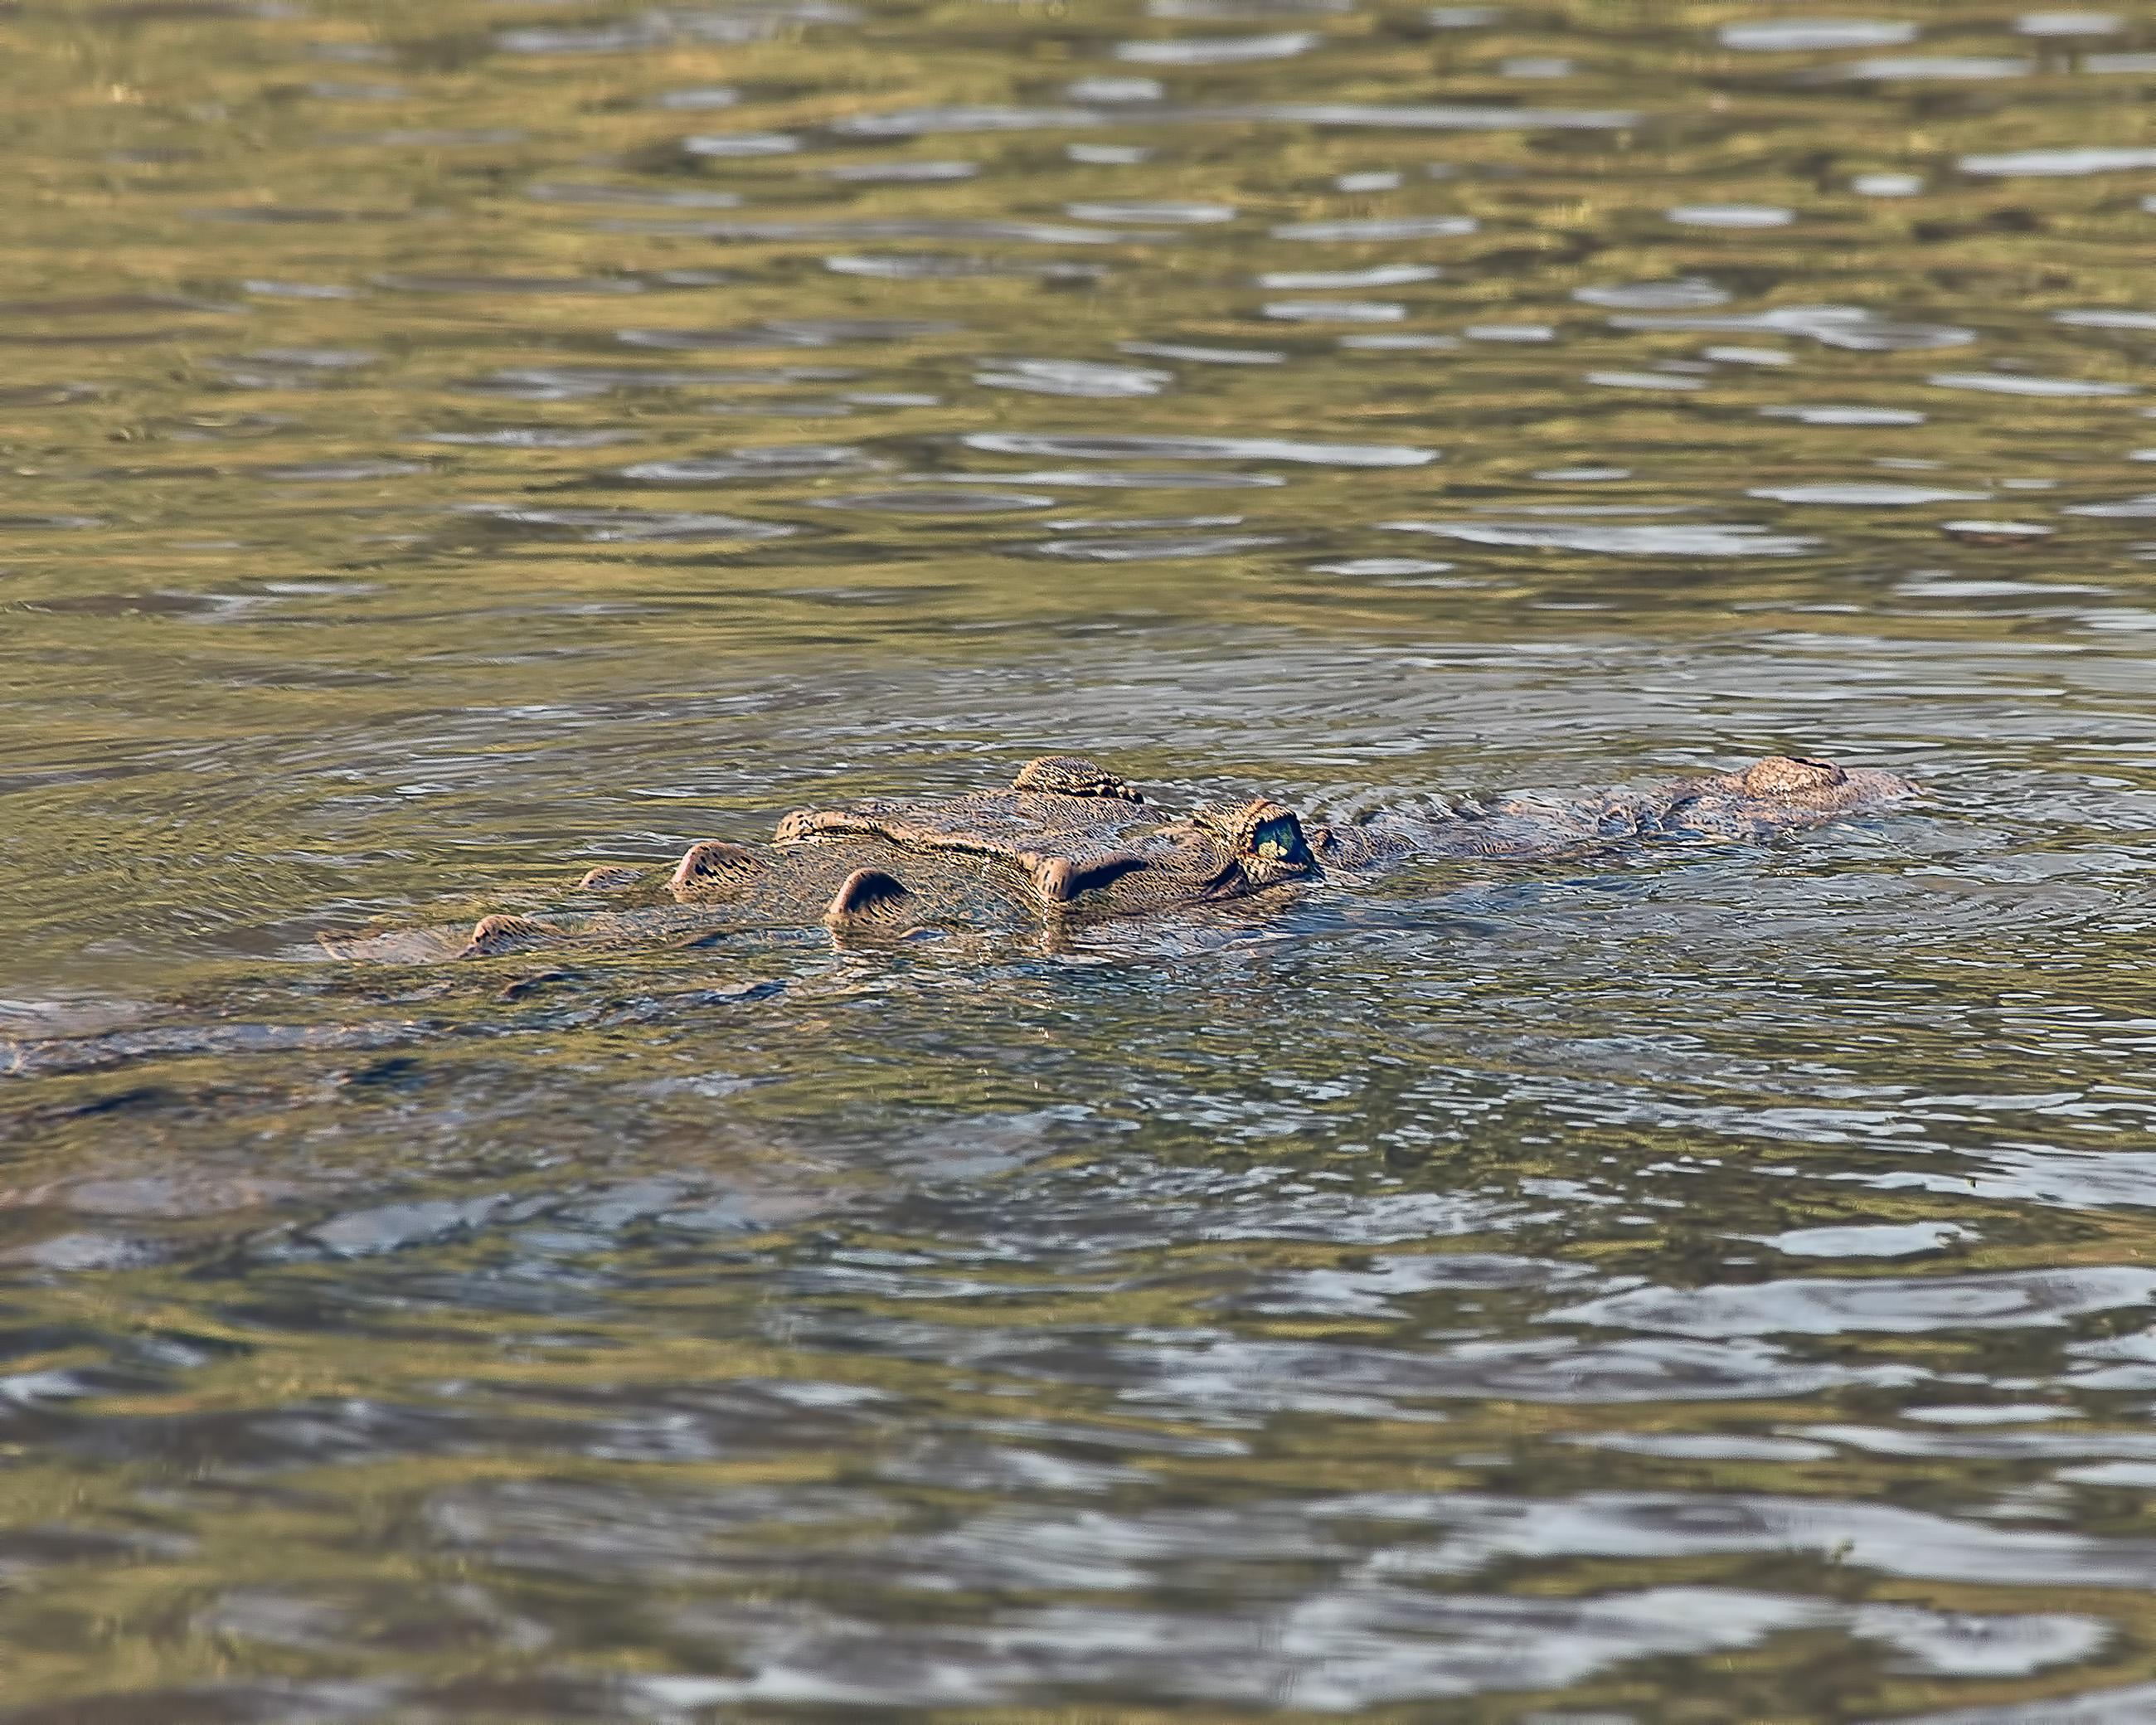 Crocodile, Adult, Salt, Nature, One, HQ Photo